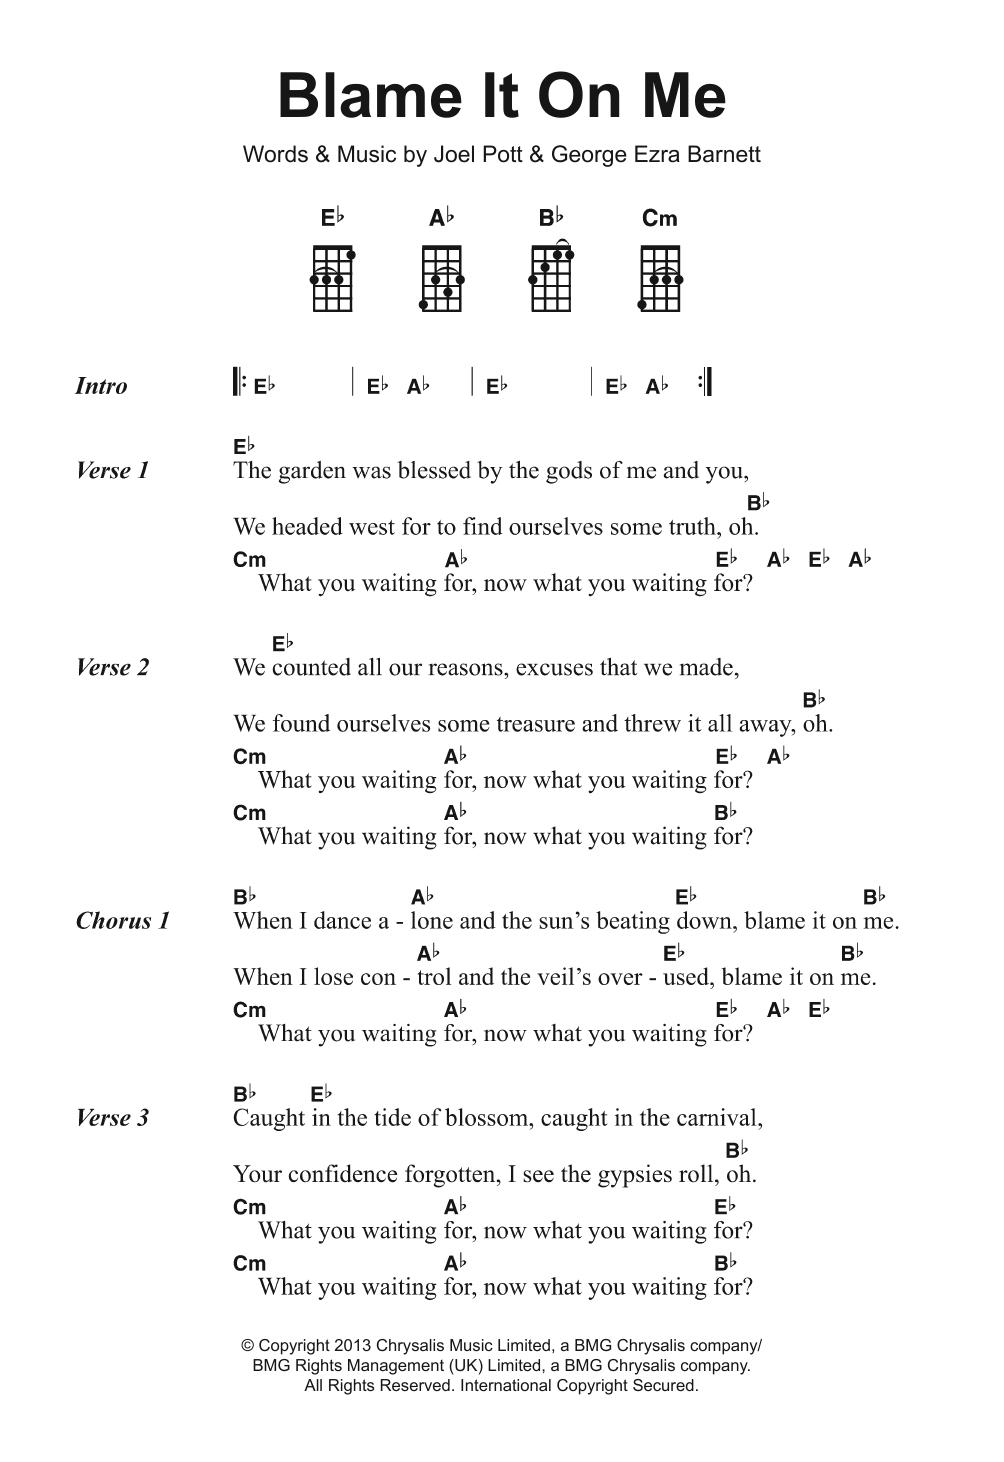 Sheet Music Digital Files To Print - Licensed George Ezra